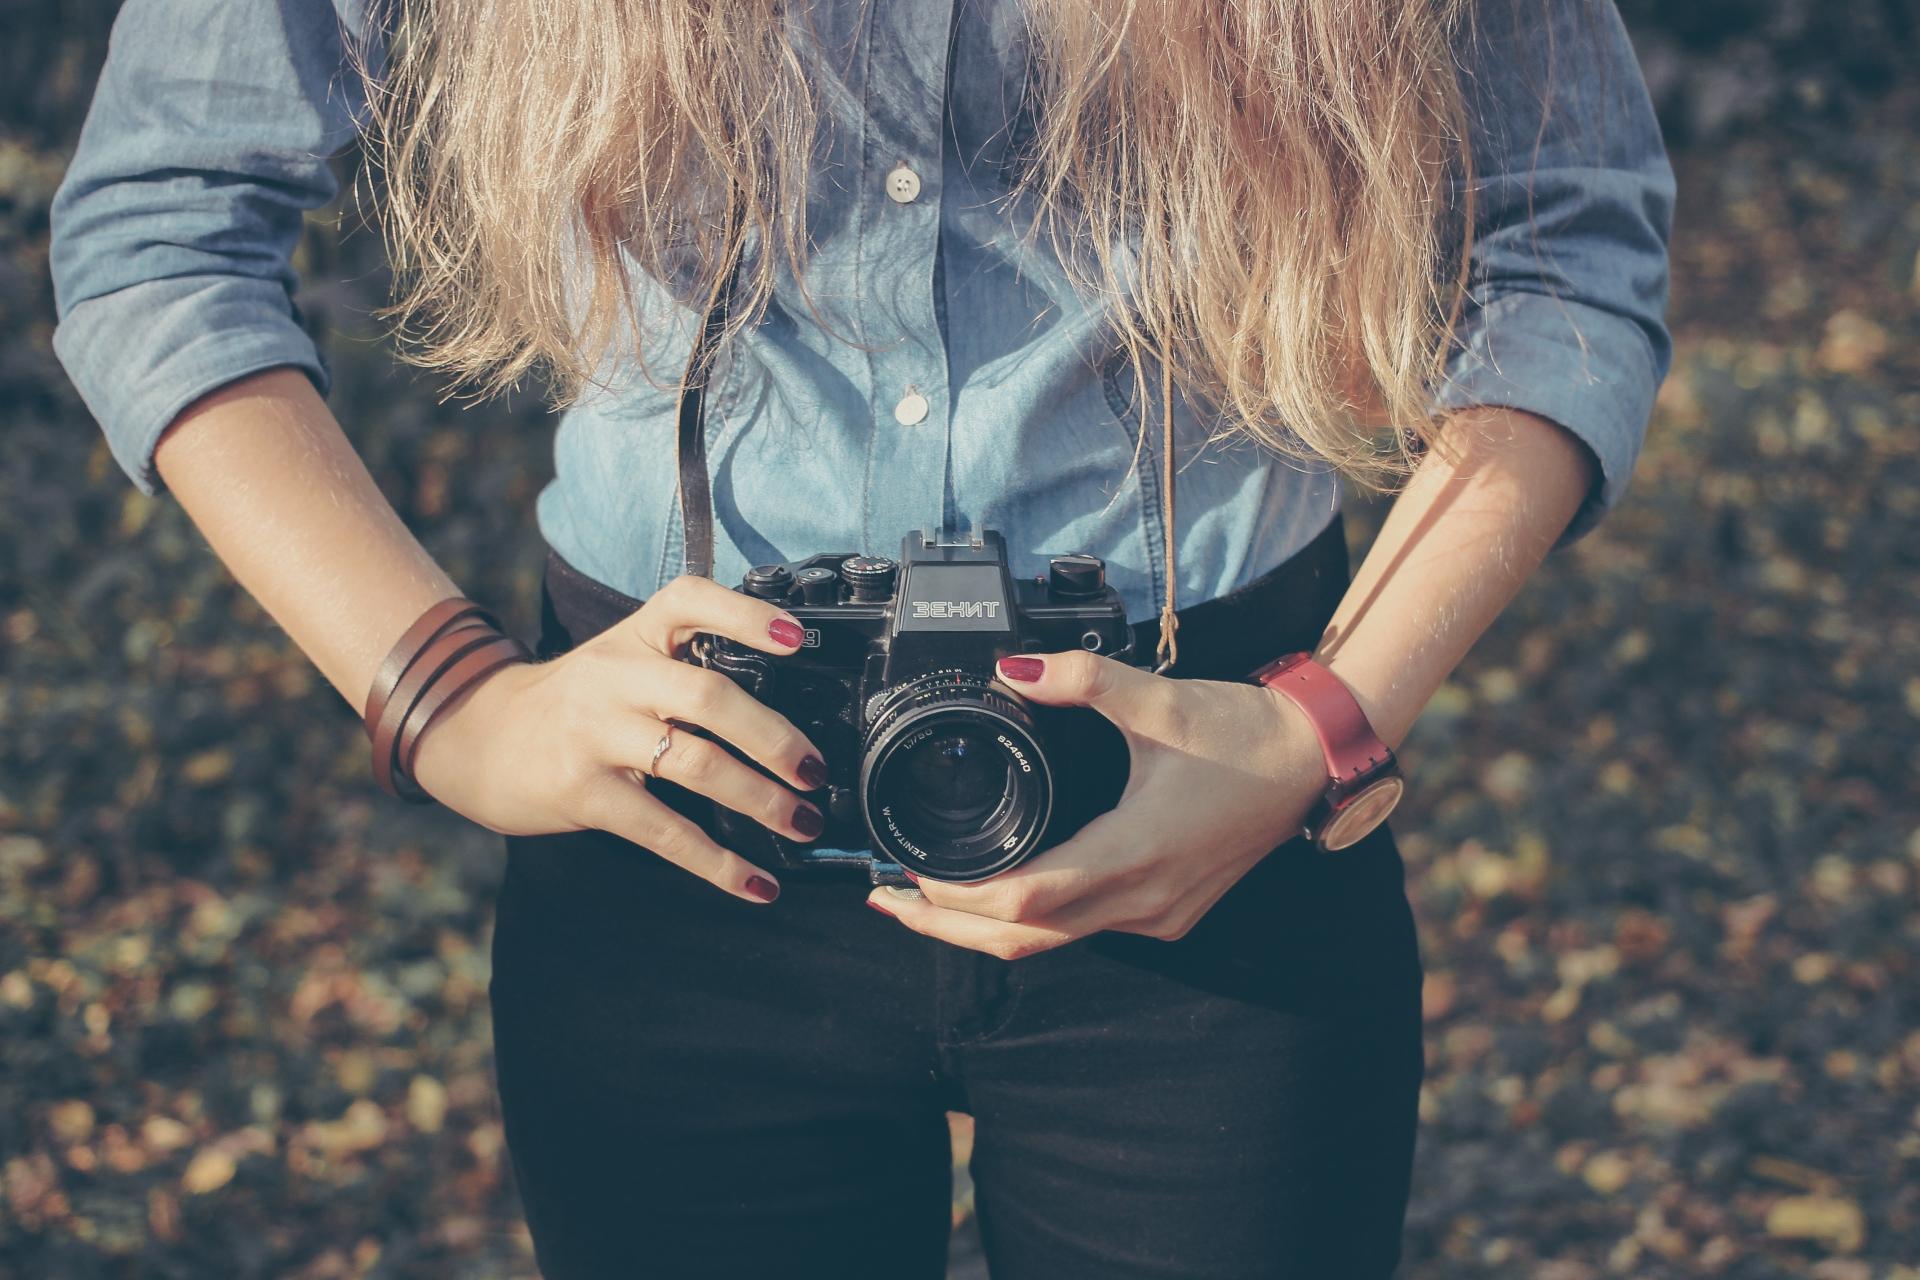 Camera around girl's neck